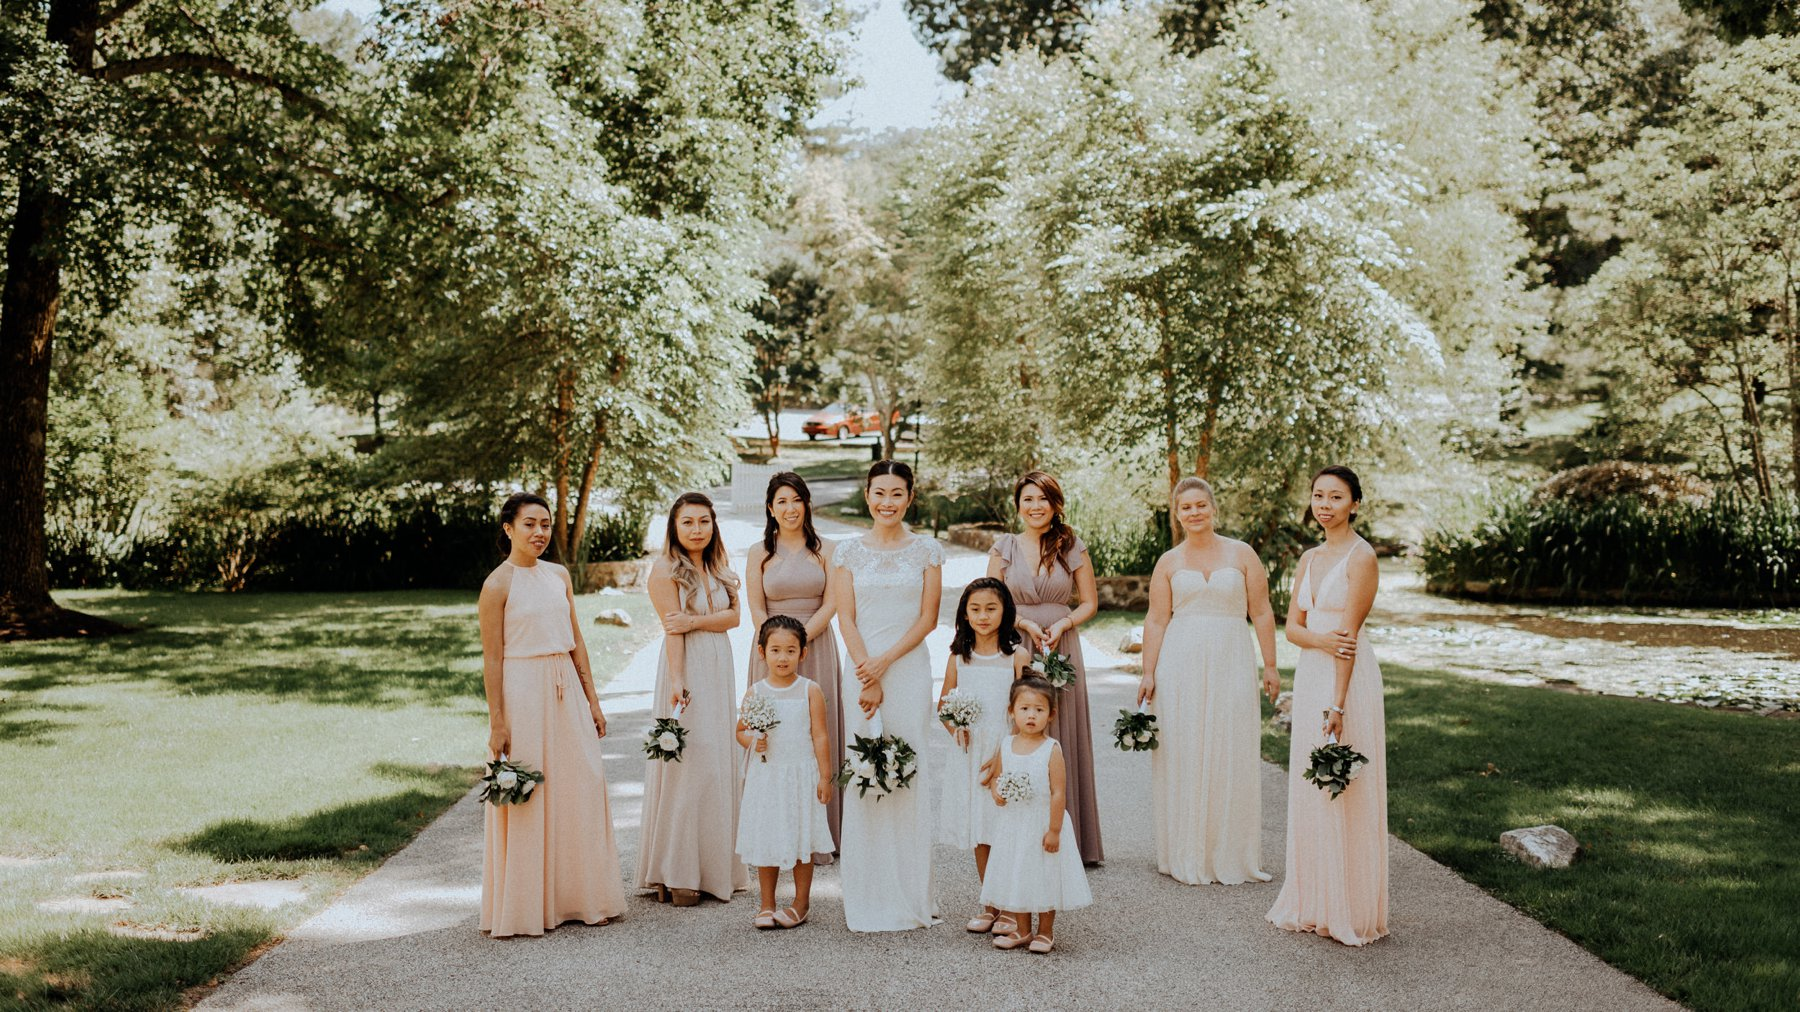 008-015-appleford-estate-wedding-13.jpg